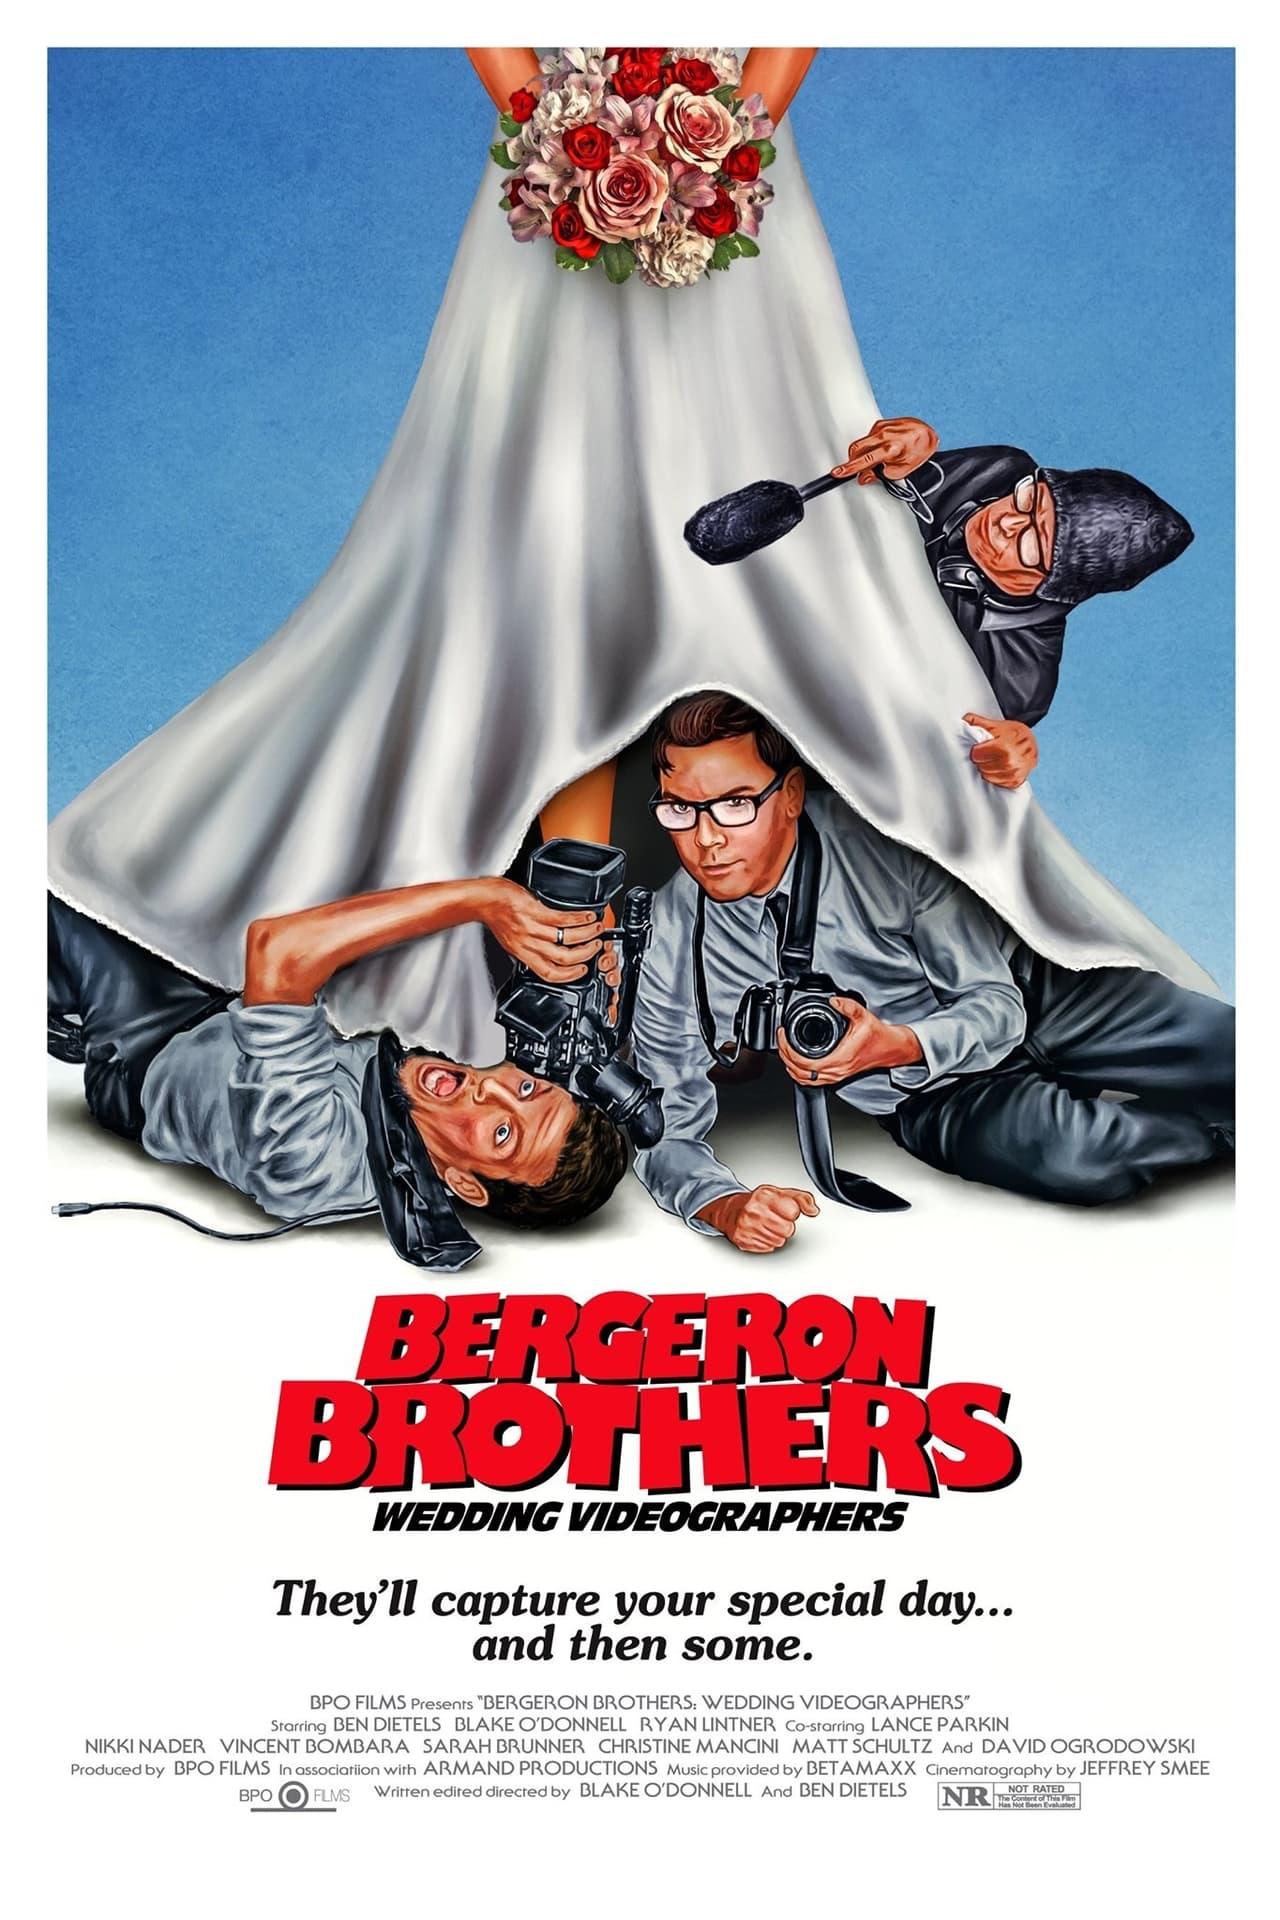 Bergeron Brothers: Wedding Videographers